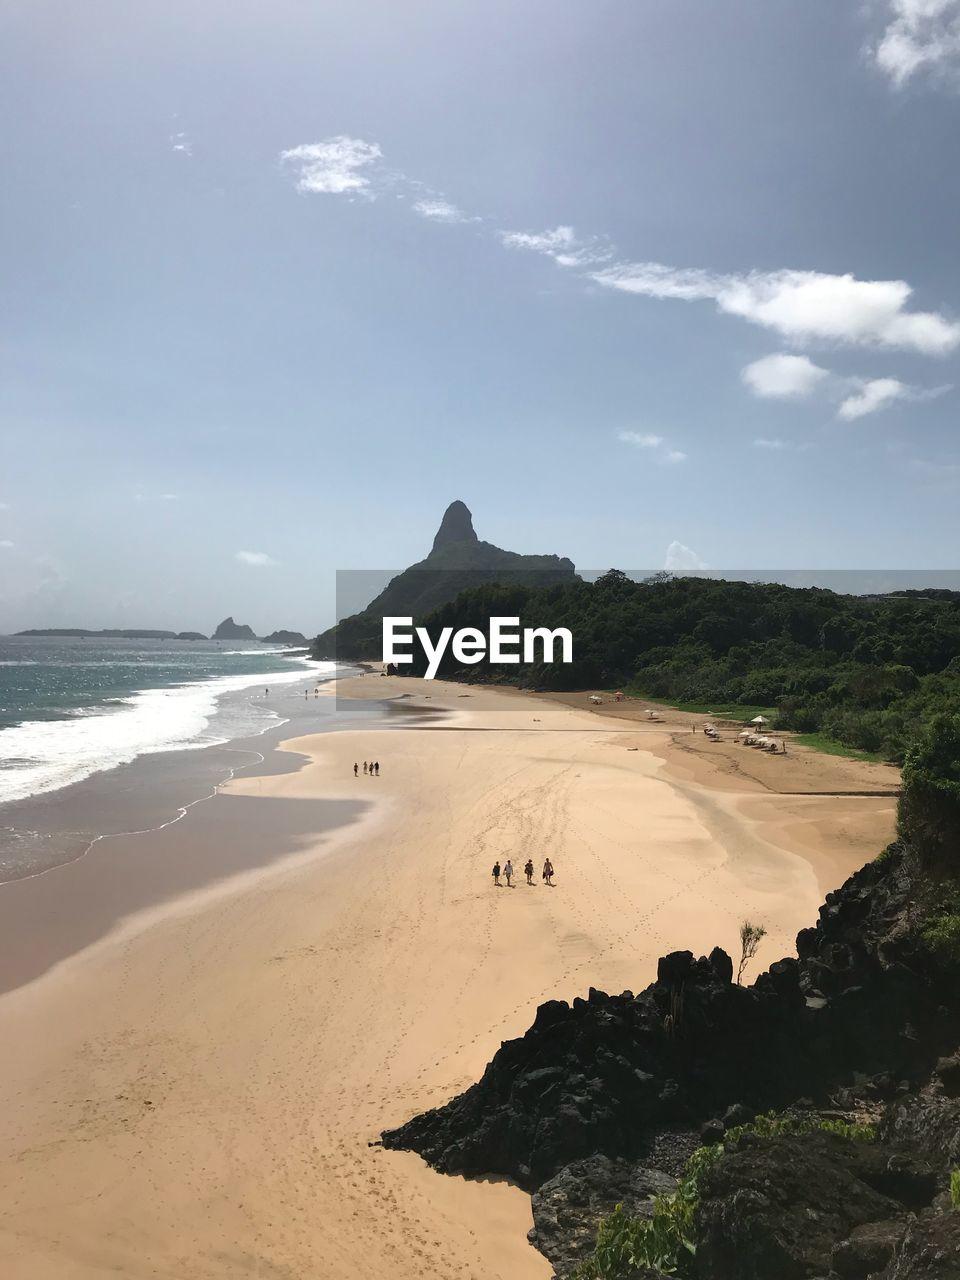 land, sea, beach, water, sky, sand, beauty in nature, scenics - nature, tranquility, nature, tranquil scene, cloud - sky, day, non-urban scene, rock, rock formation, outdoors, idyllic, coastline